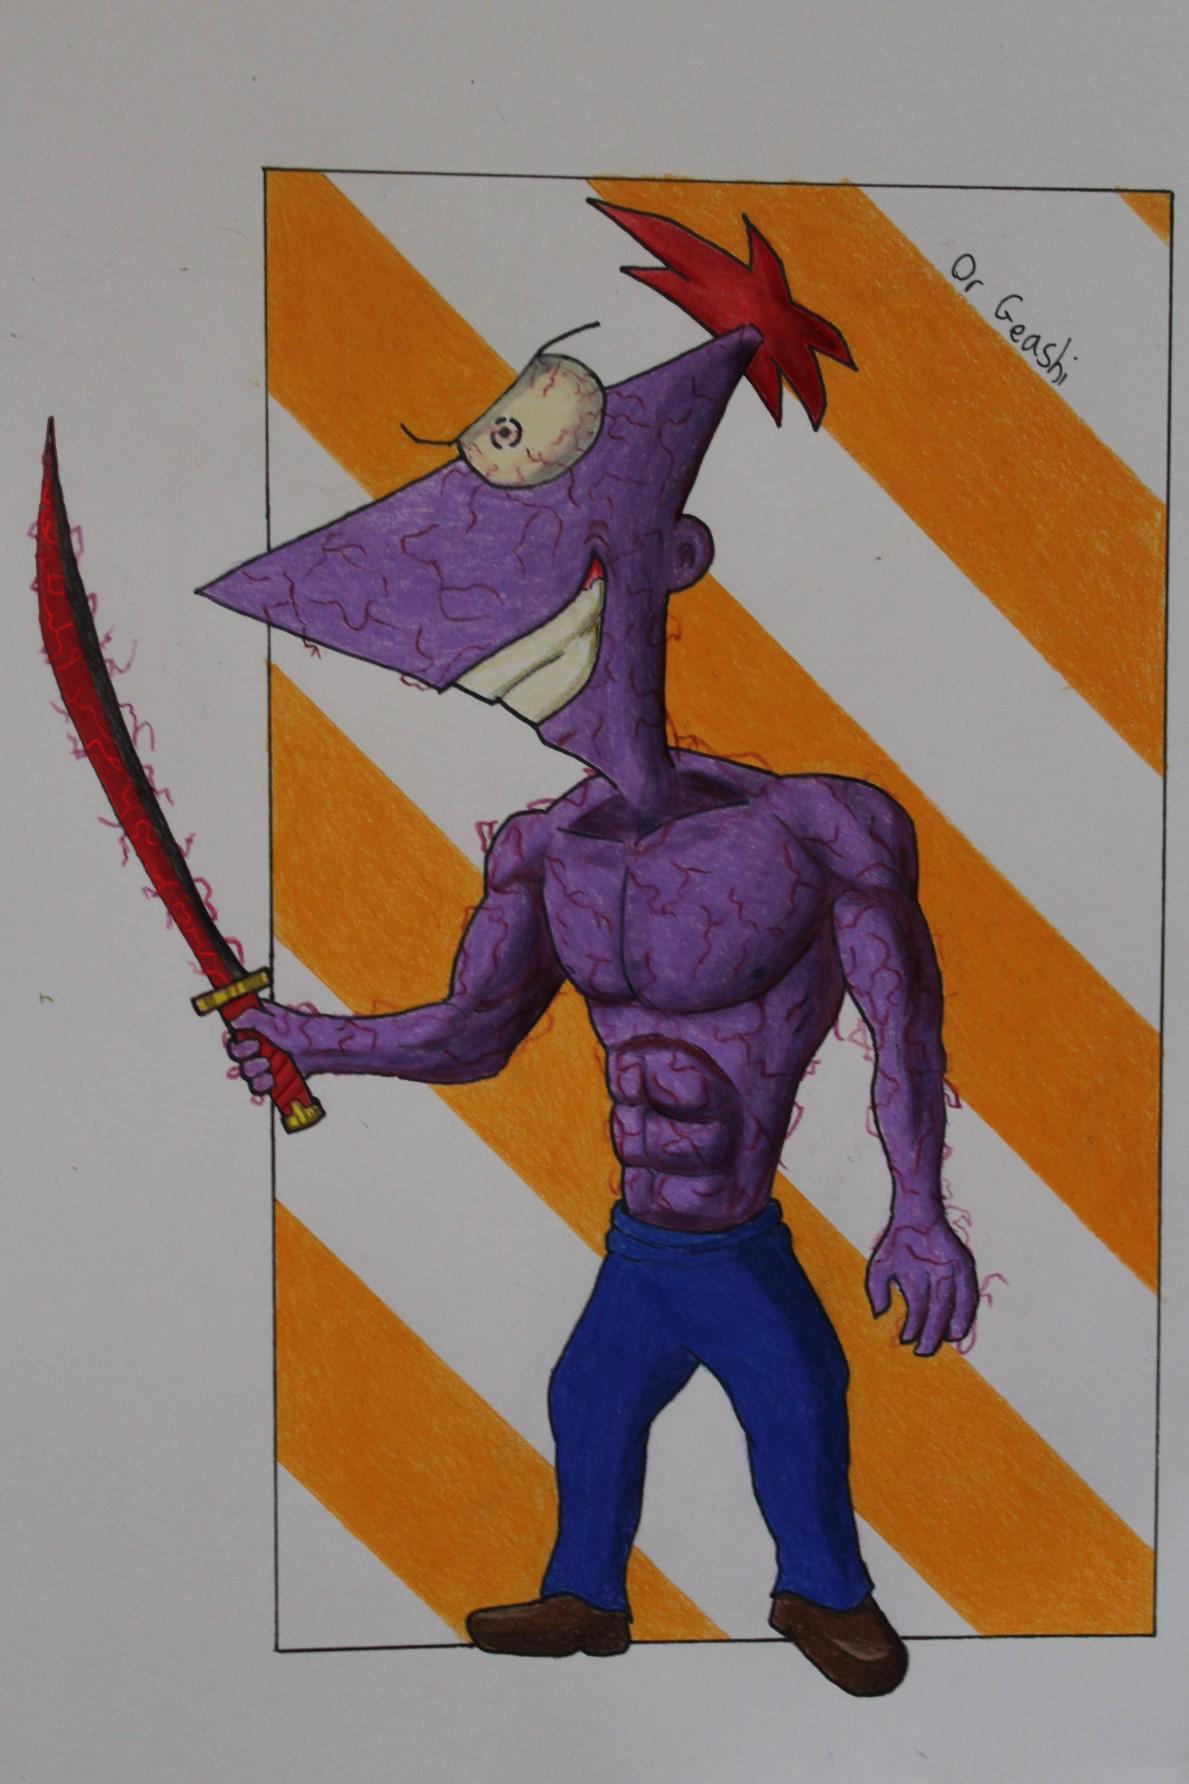 Phineas Level 99